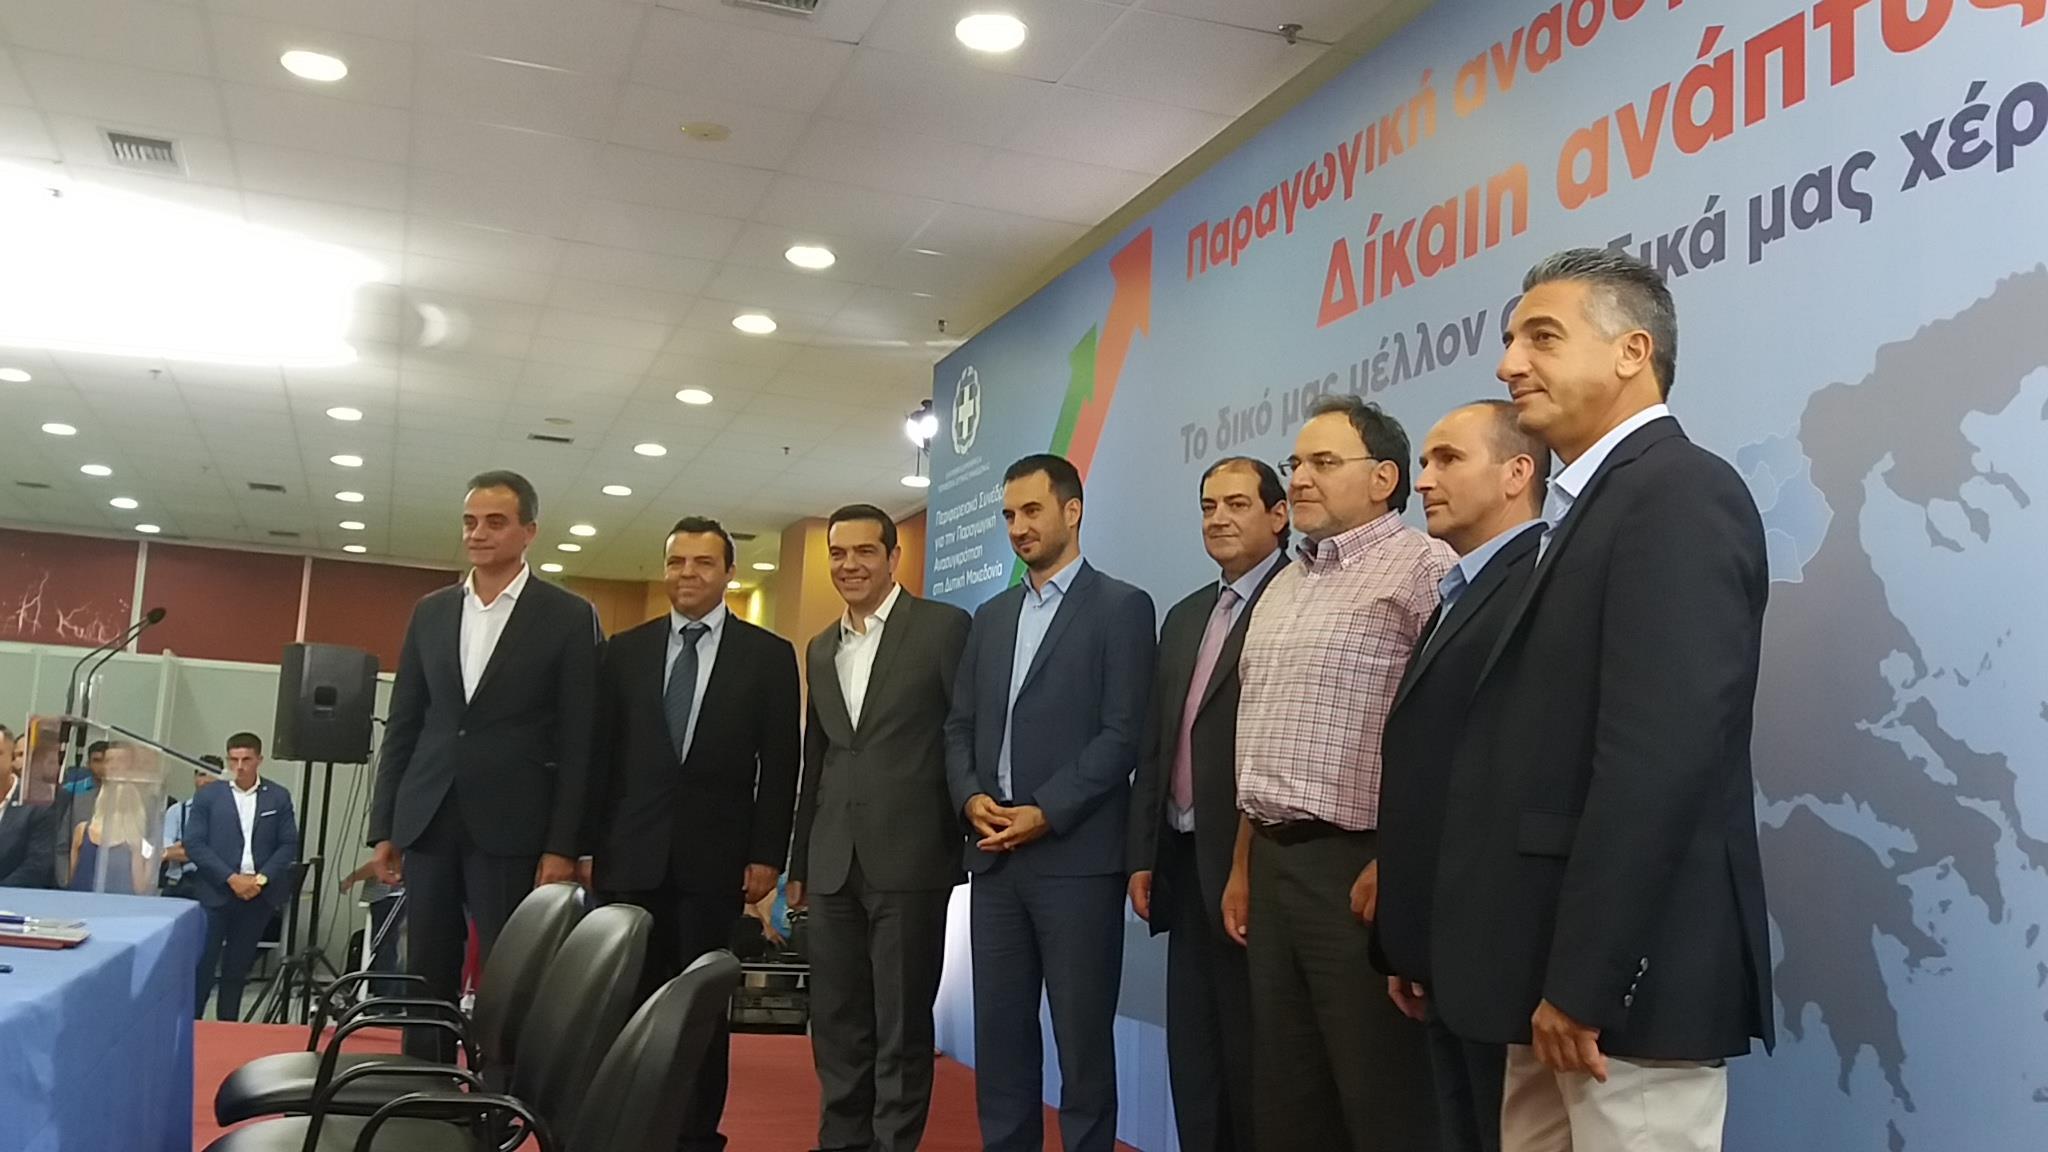 kozan.gr: Υπεγράφη η συμφωνία για τη Σύσταση του Ταμείου Ανάπτυξης Δυτικής Μακεδονία (Φωτογραφίες)